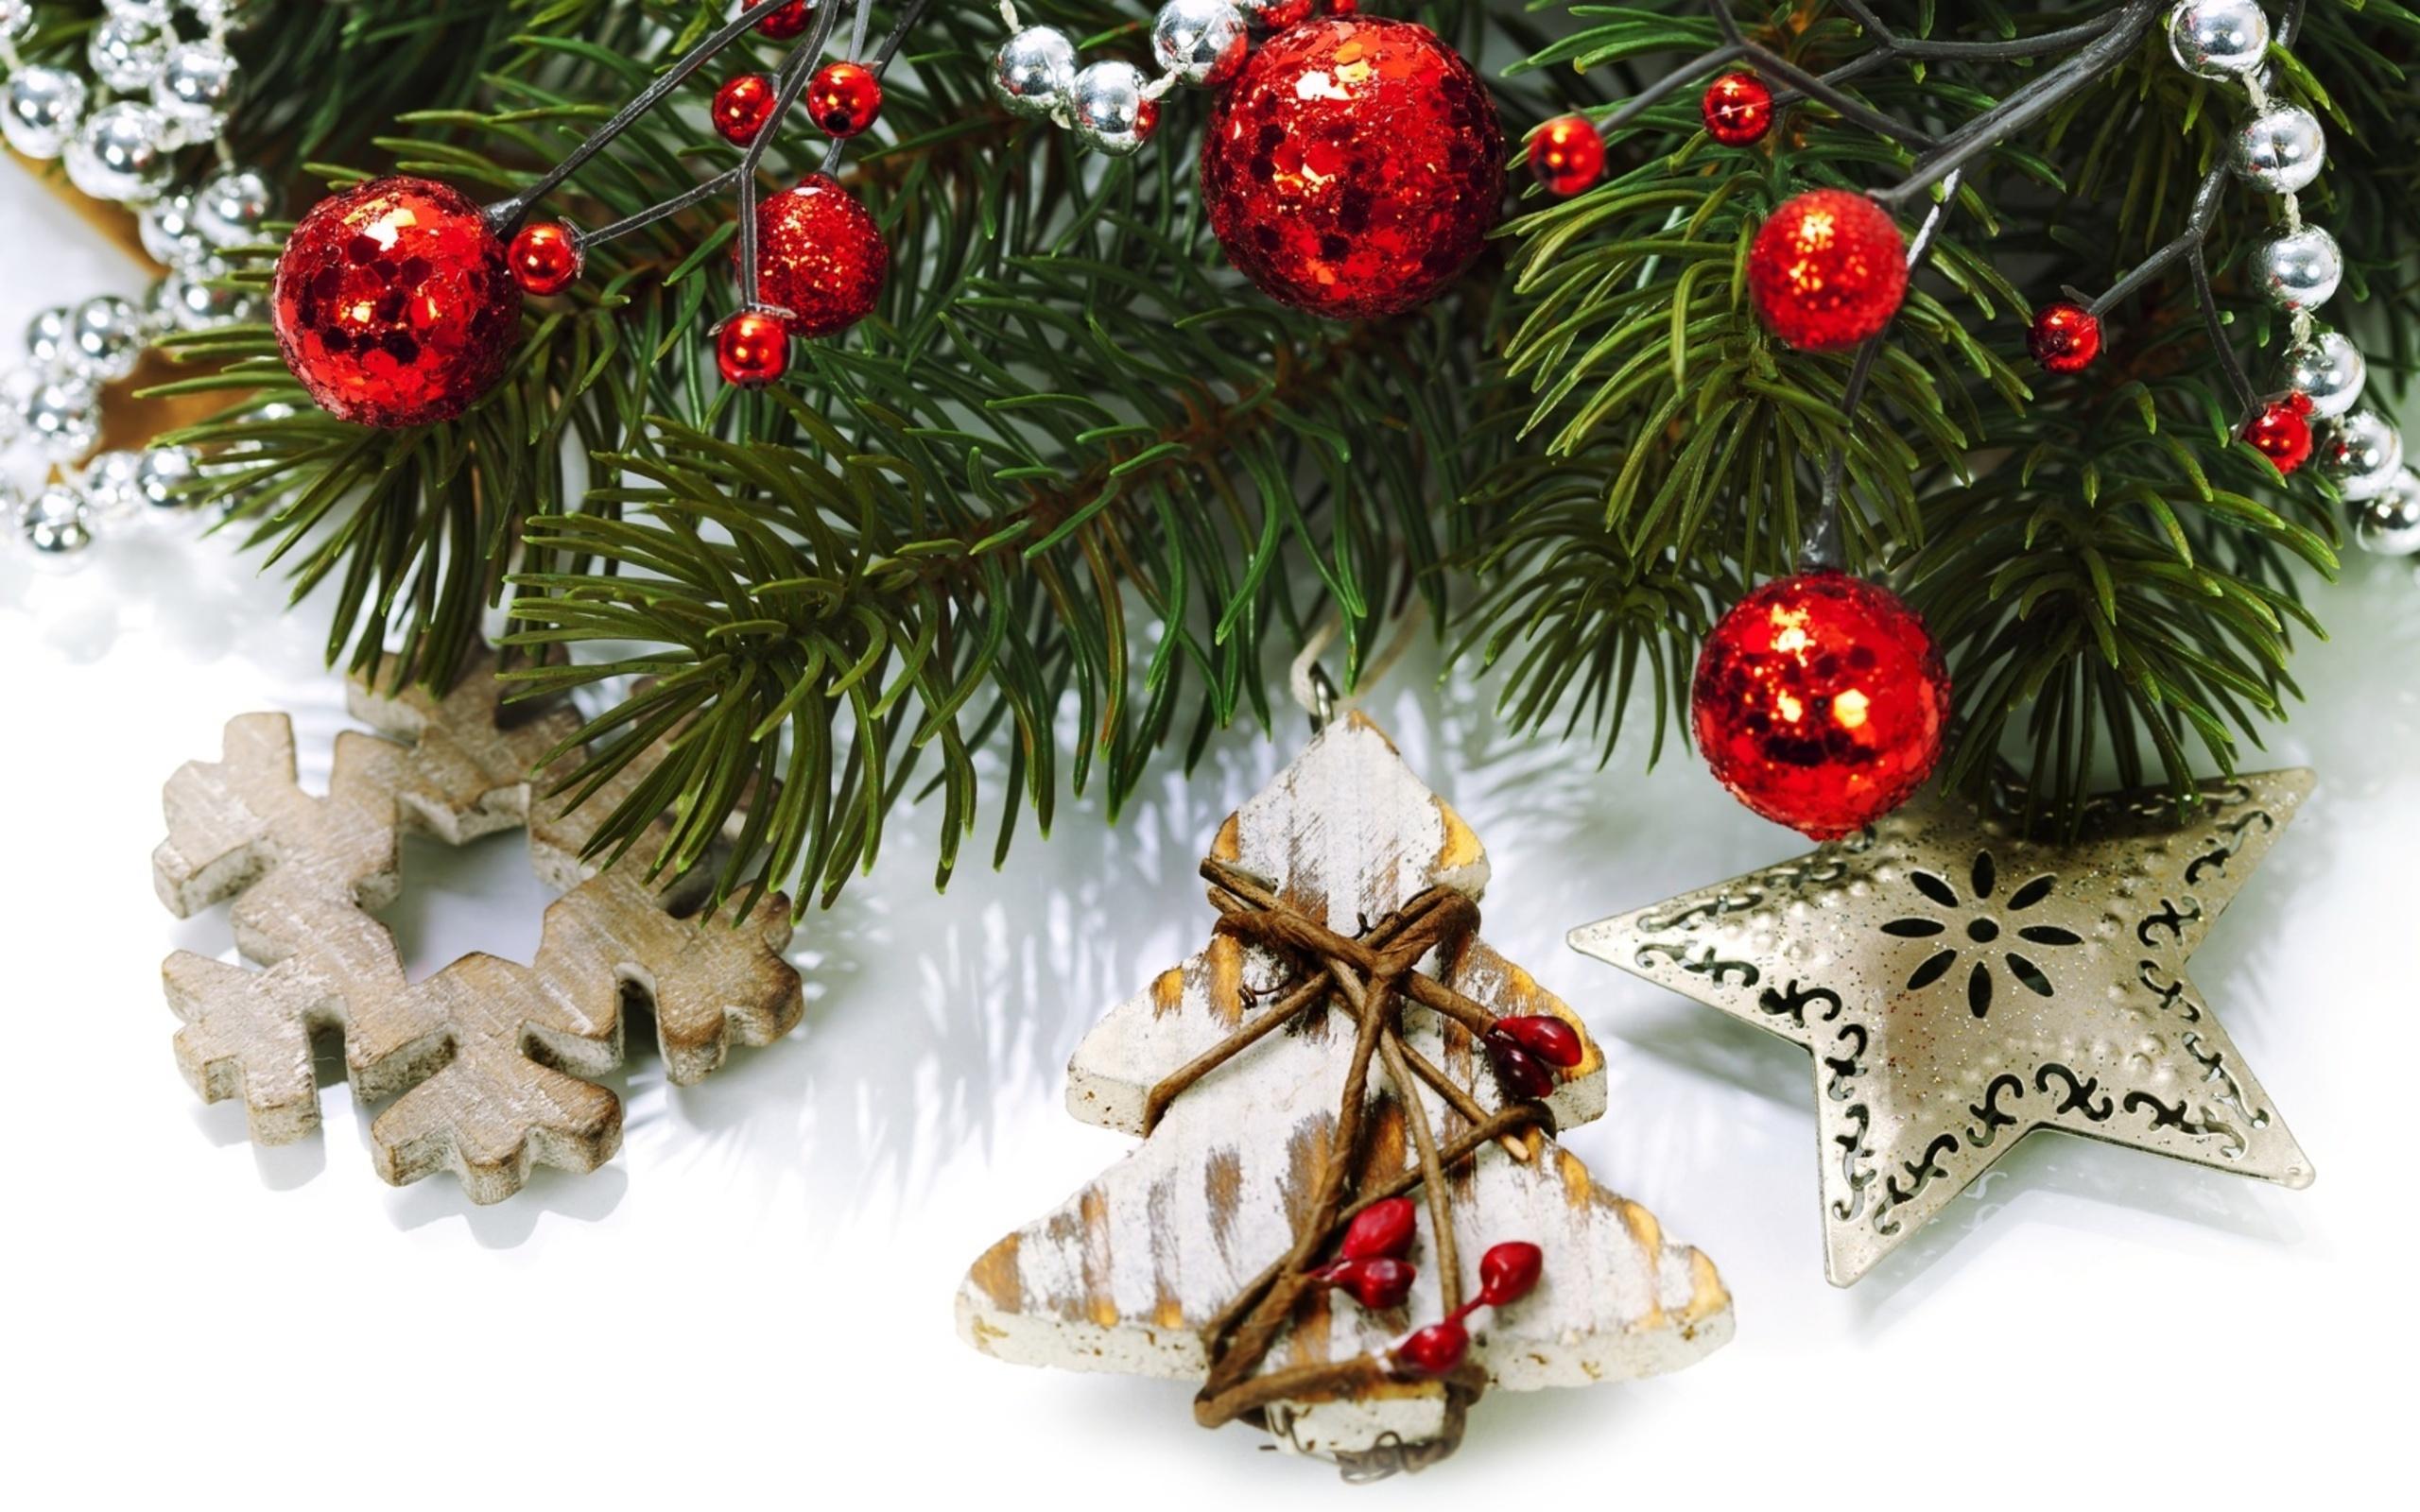 Fond D écran Vacances De Noël: Noël Full HD Fond D'écran And Arrière-Plan